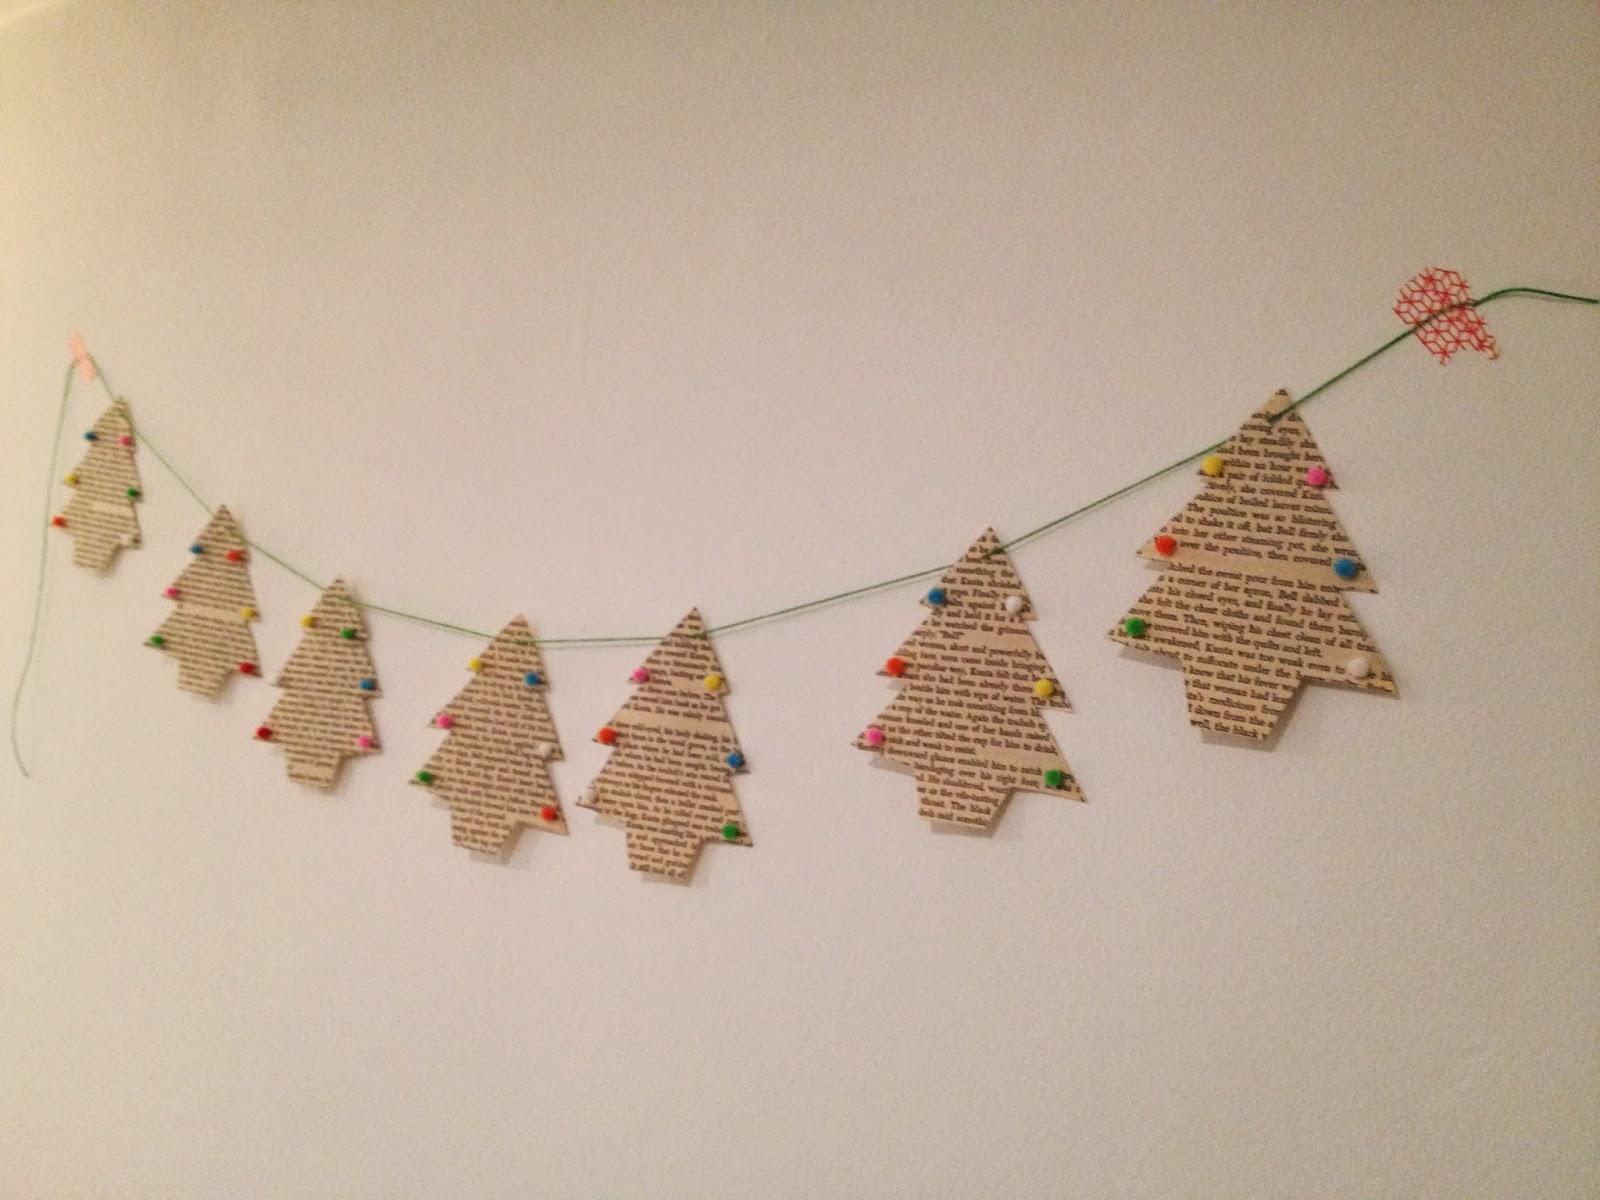 Lingosworld lingo guirnalda de navidad - Guirnalda de navidad ...